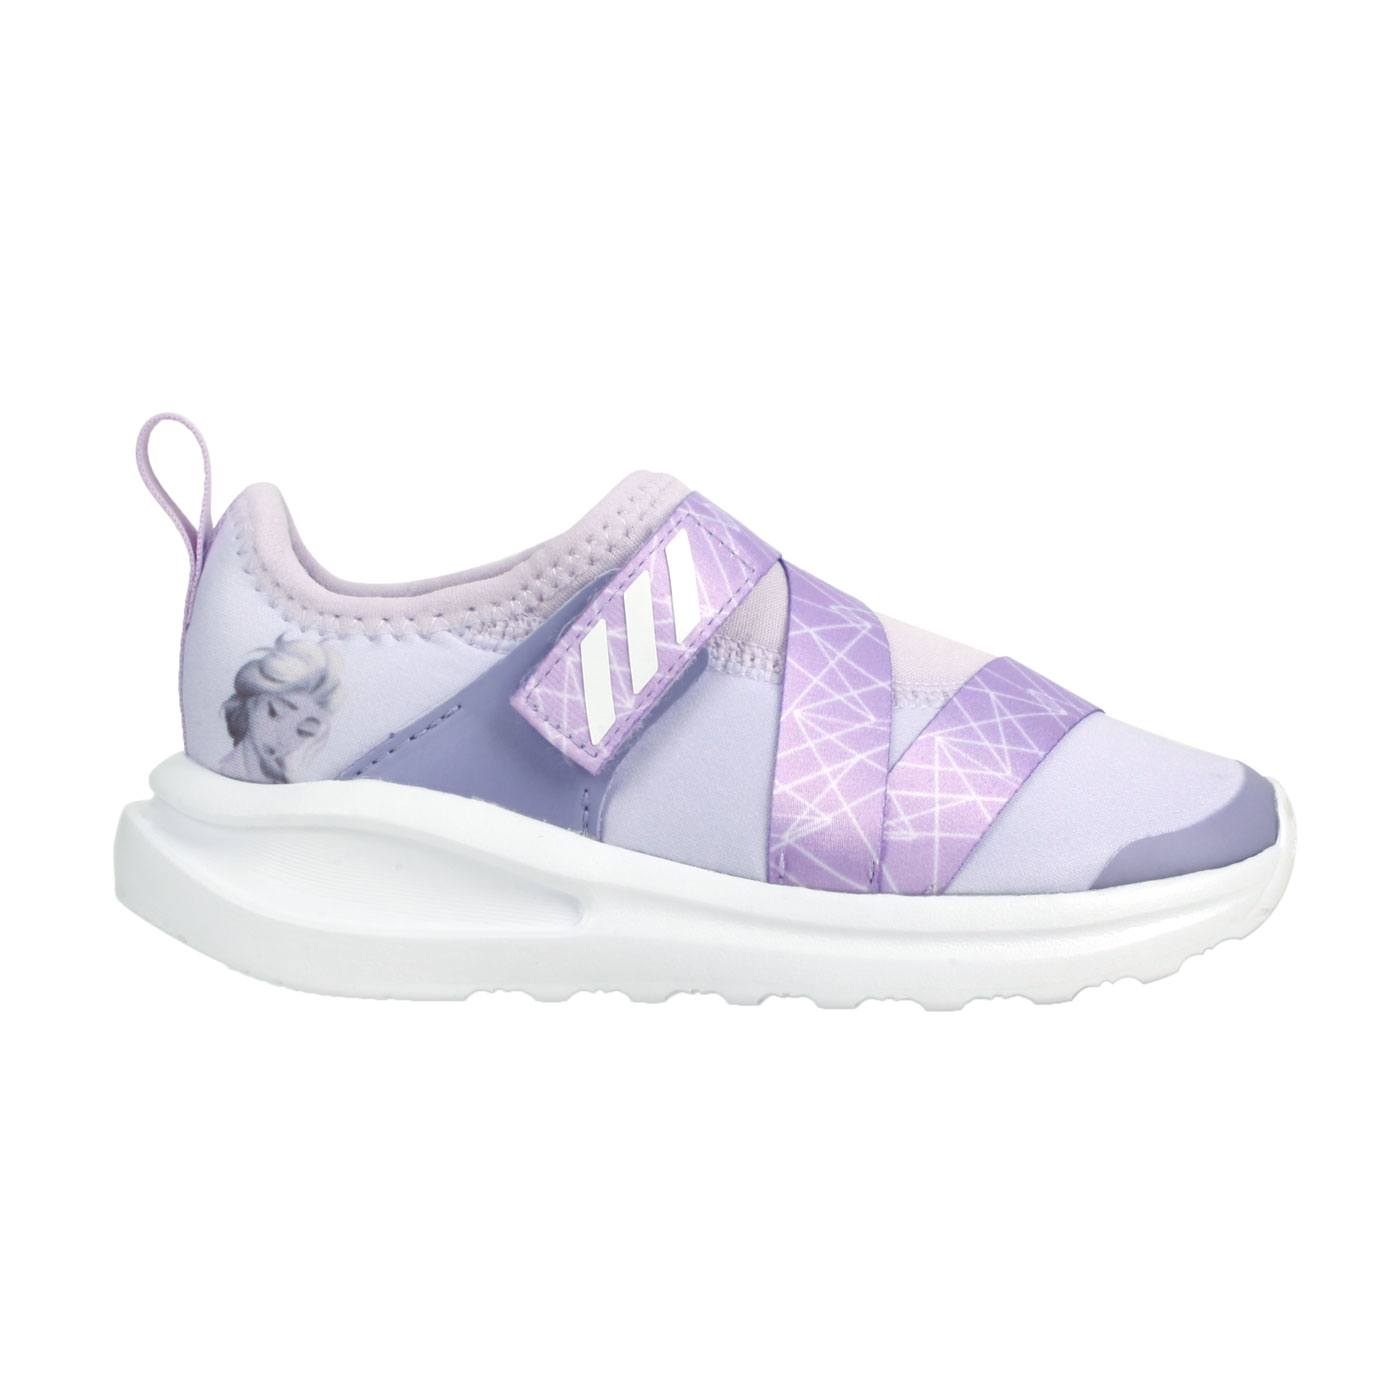 ADIDAS 小童休閒運動鞋  @FortaRun X Frozen I@FV4262 - 粉紫白